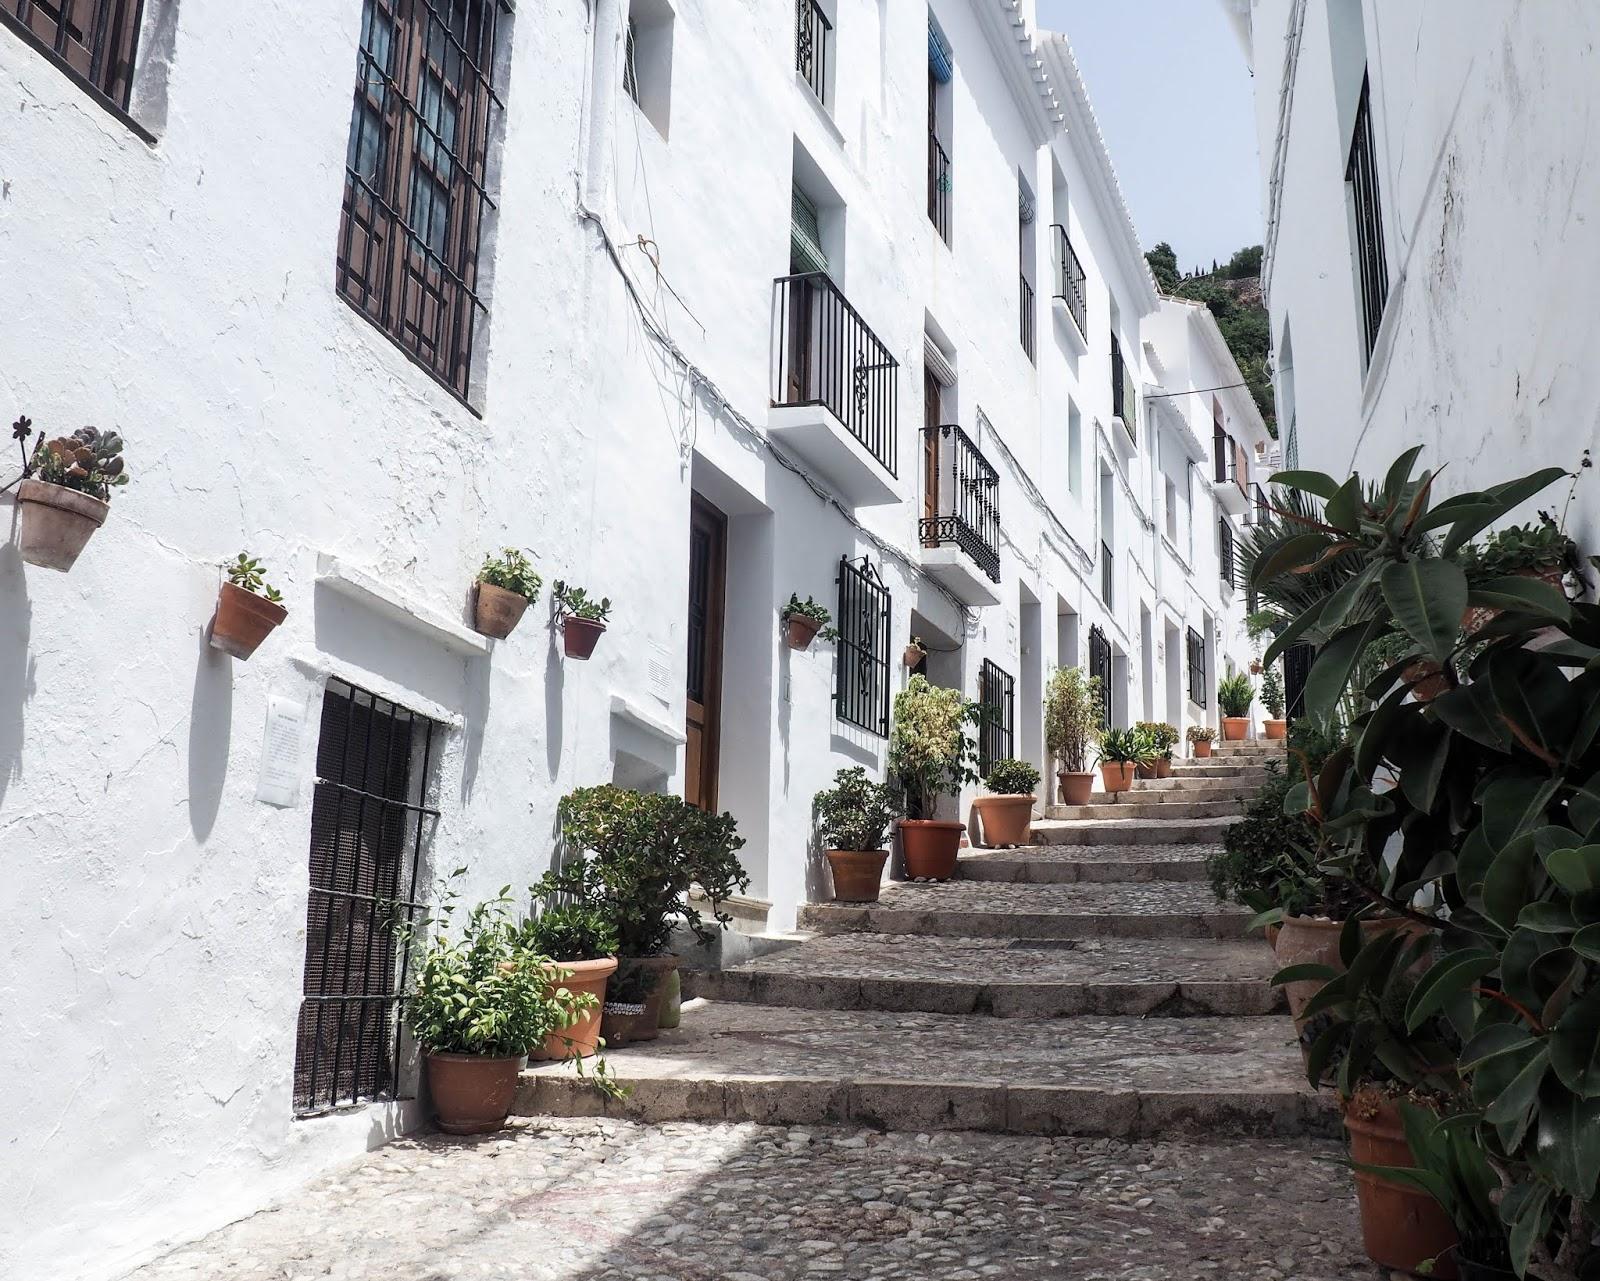 Frigiliana, Andalucia, Spain, Espanja, Costa del Sol, Aurinkorannikko